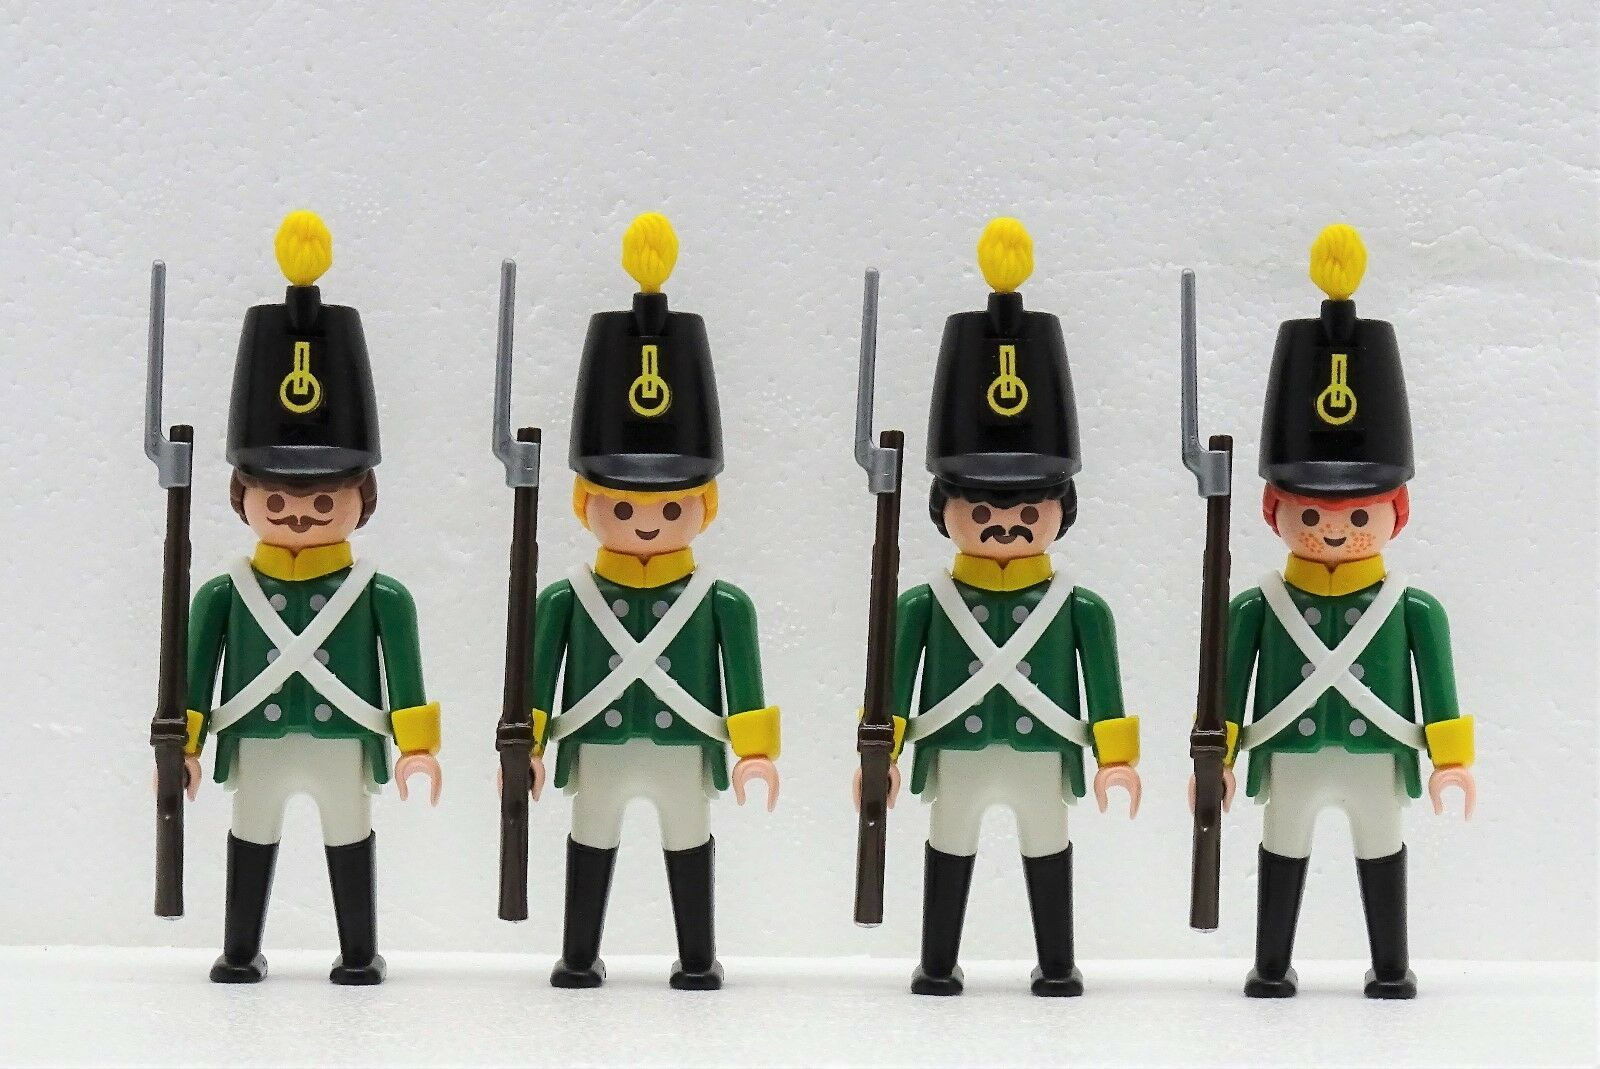 4 x GRÜNROCK SOLDAT Playmobil zu Tschako Kreuzgurt Stiefelbeine Grünröcke 3859